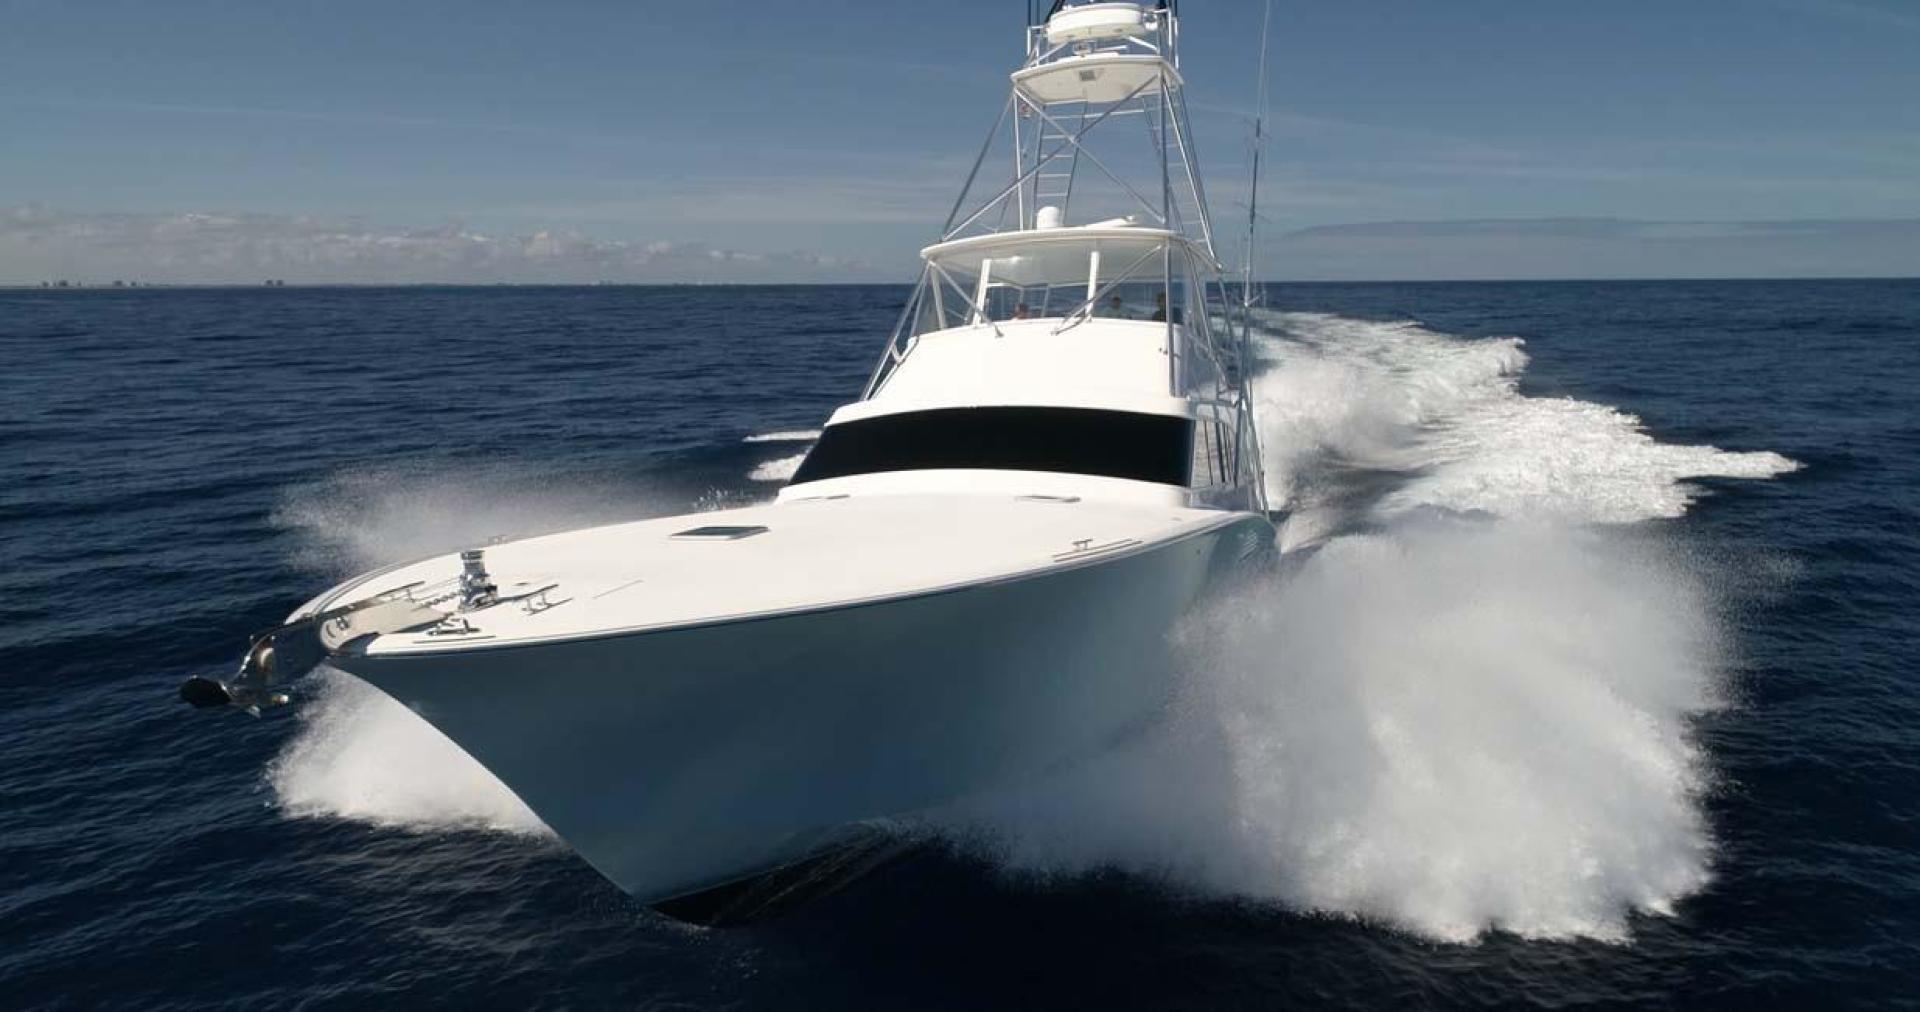 Jim-Smith-Custom-Convertible-Sportfish-2006-Silky-Palm-Beach-Florida-United-States-2006-Jim-Smith-Custom-Convertible-68-Running-924599